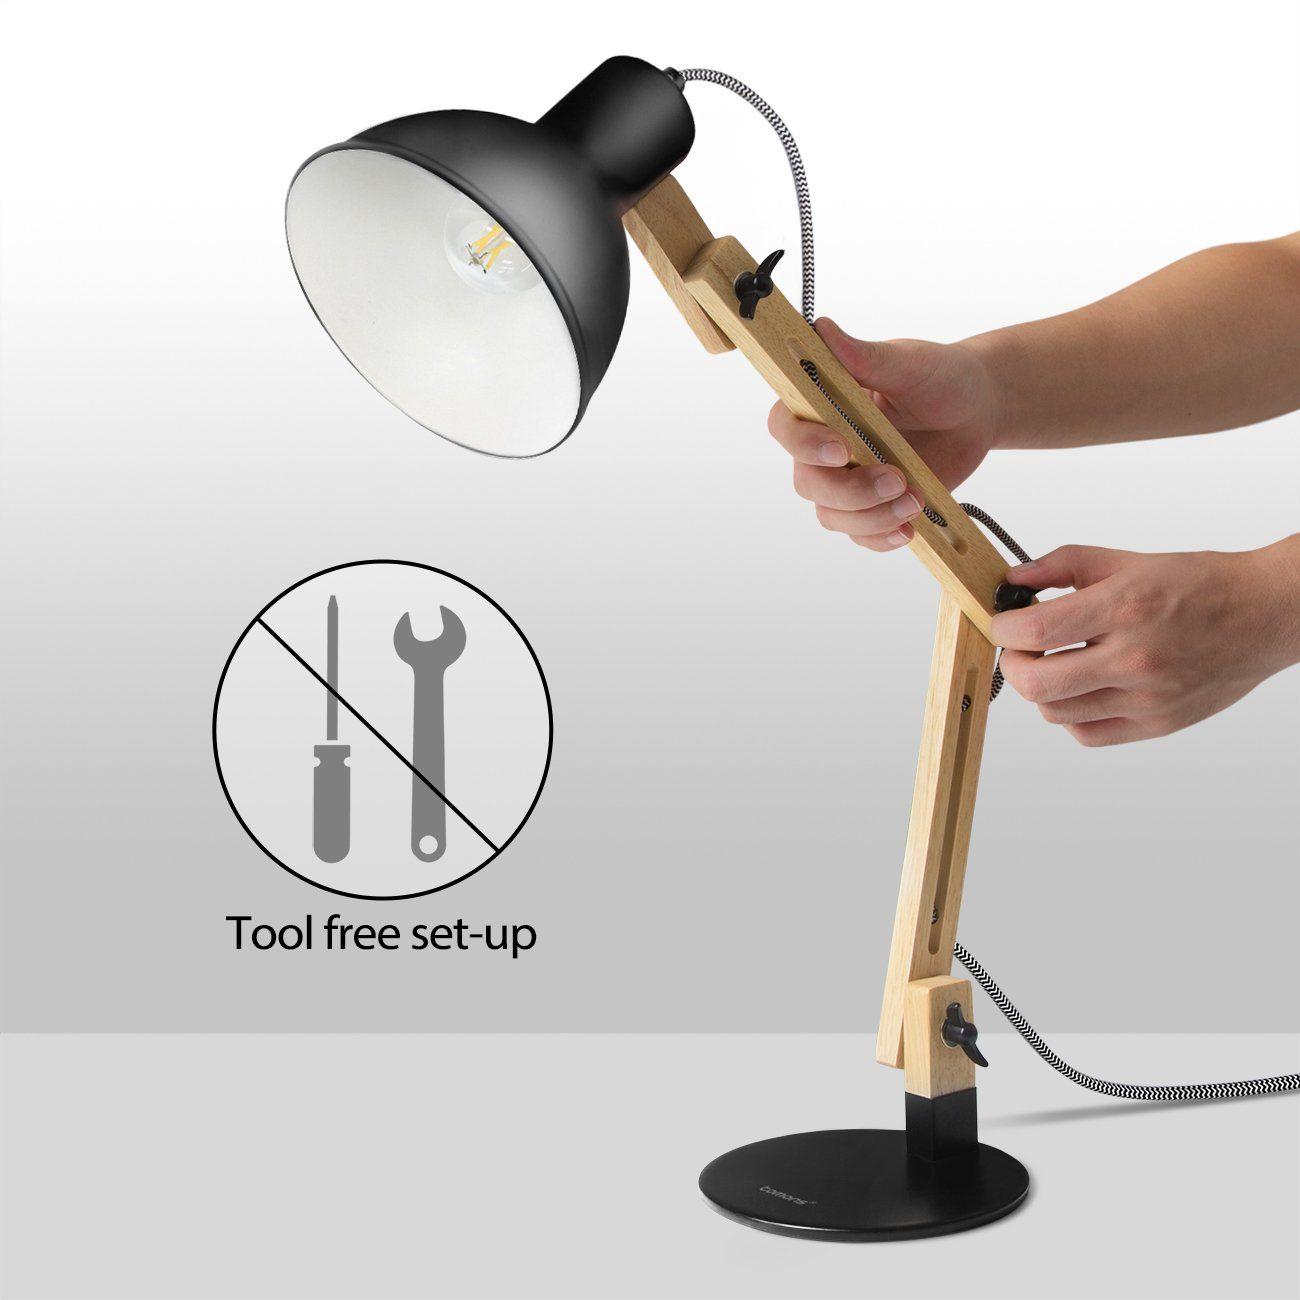 Tomons Adjustable Swing Arm Desk Wood Lamp Scandinavian Drafting Light White Affilink Lamps Lampshades Lampshadeideasap Desk Lamp Led Desk Lamp Study Lamps